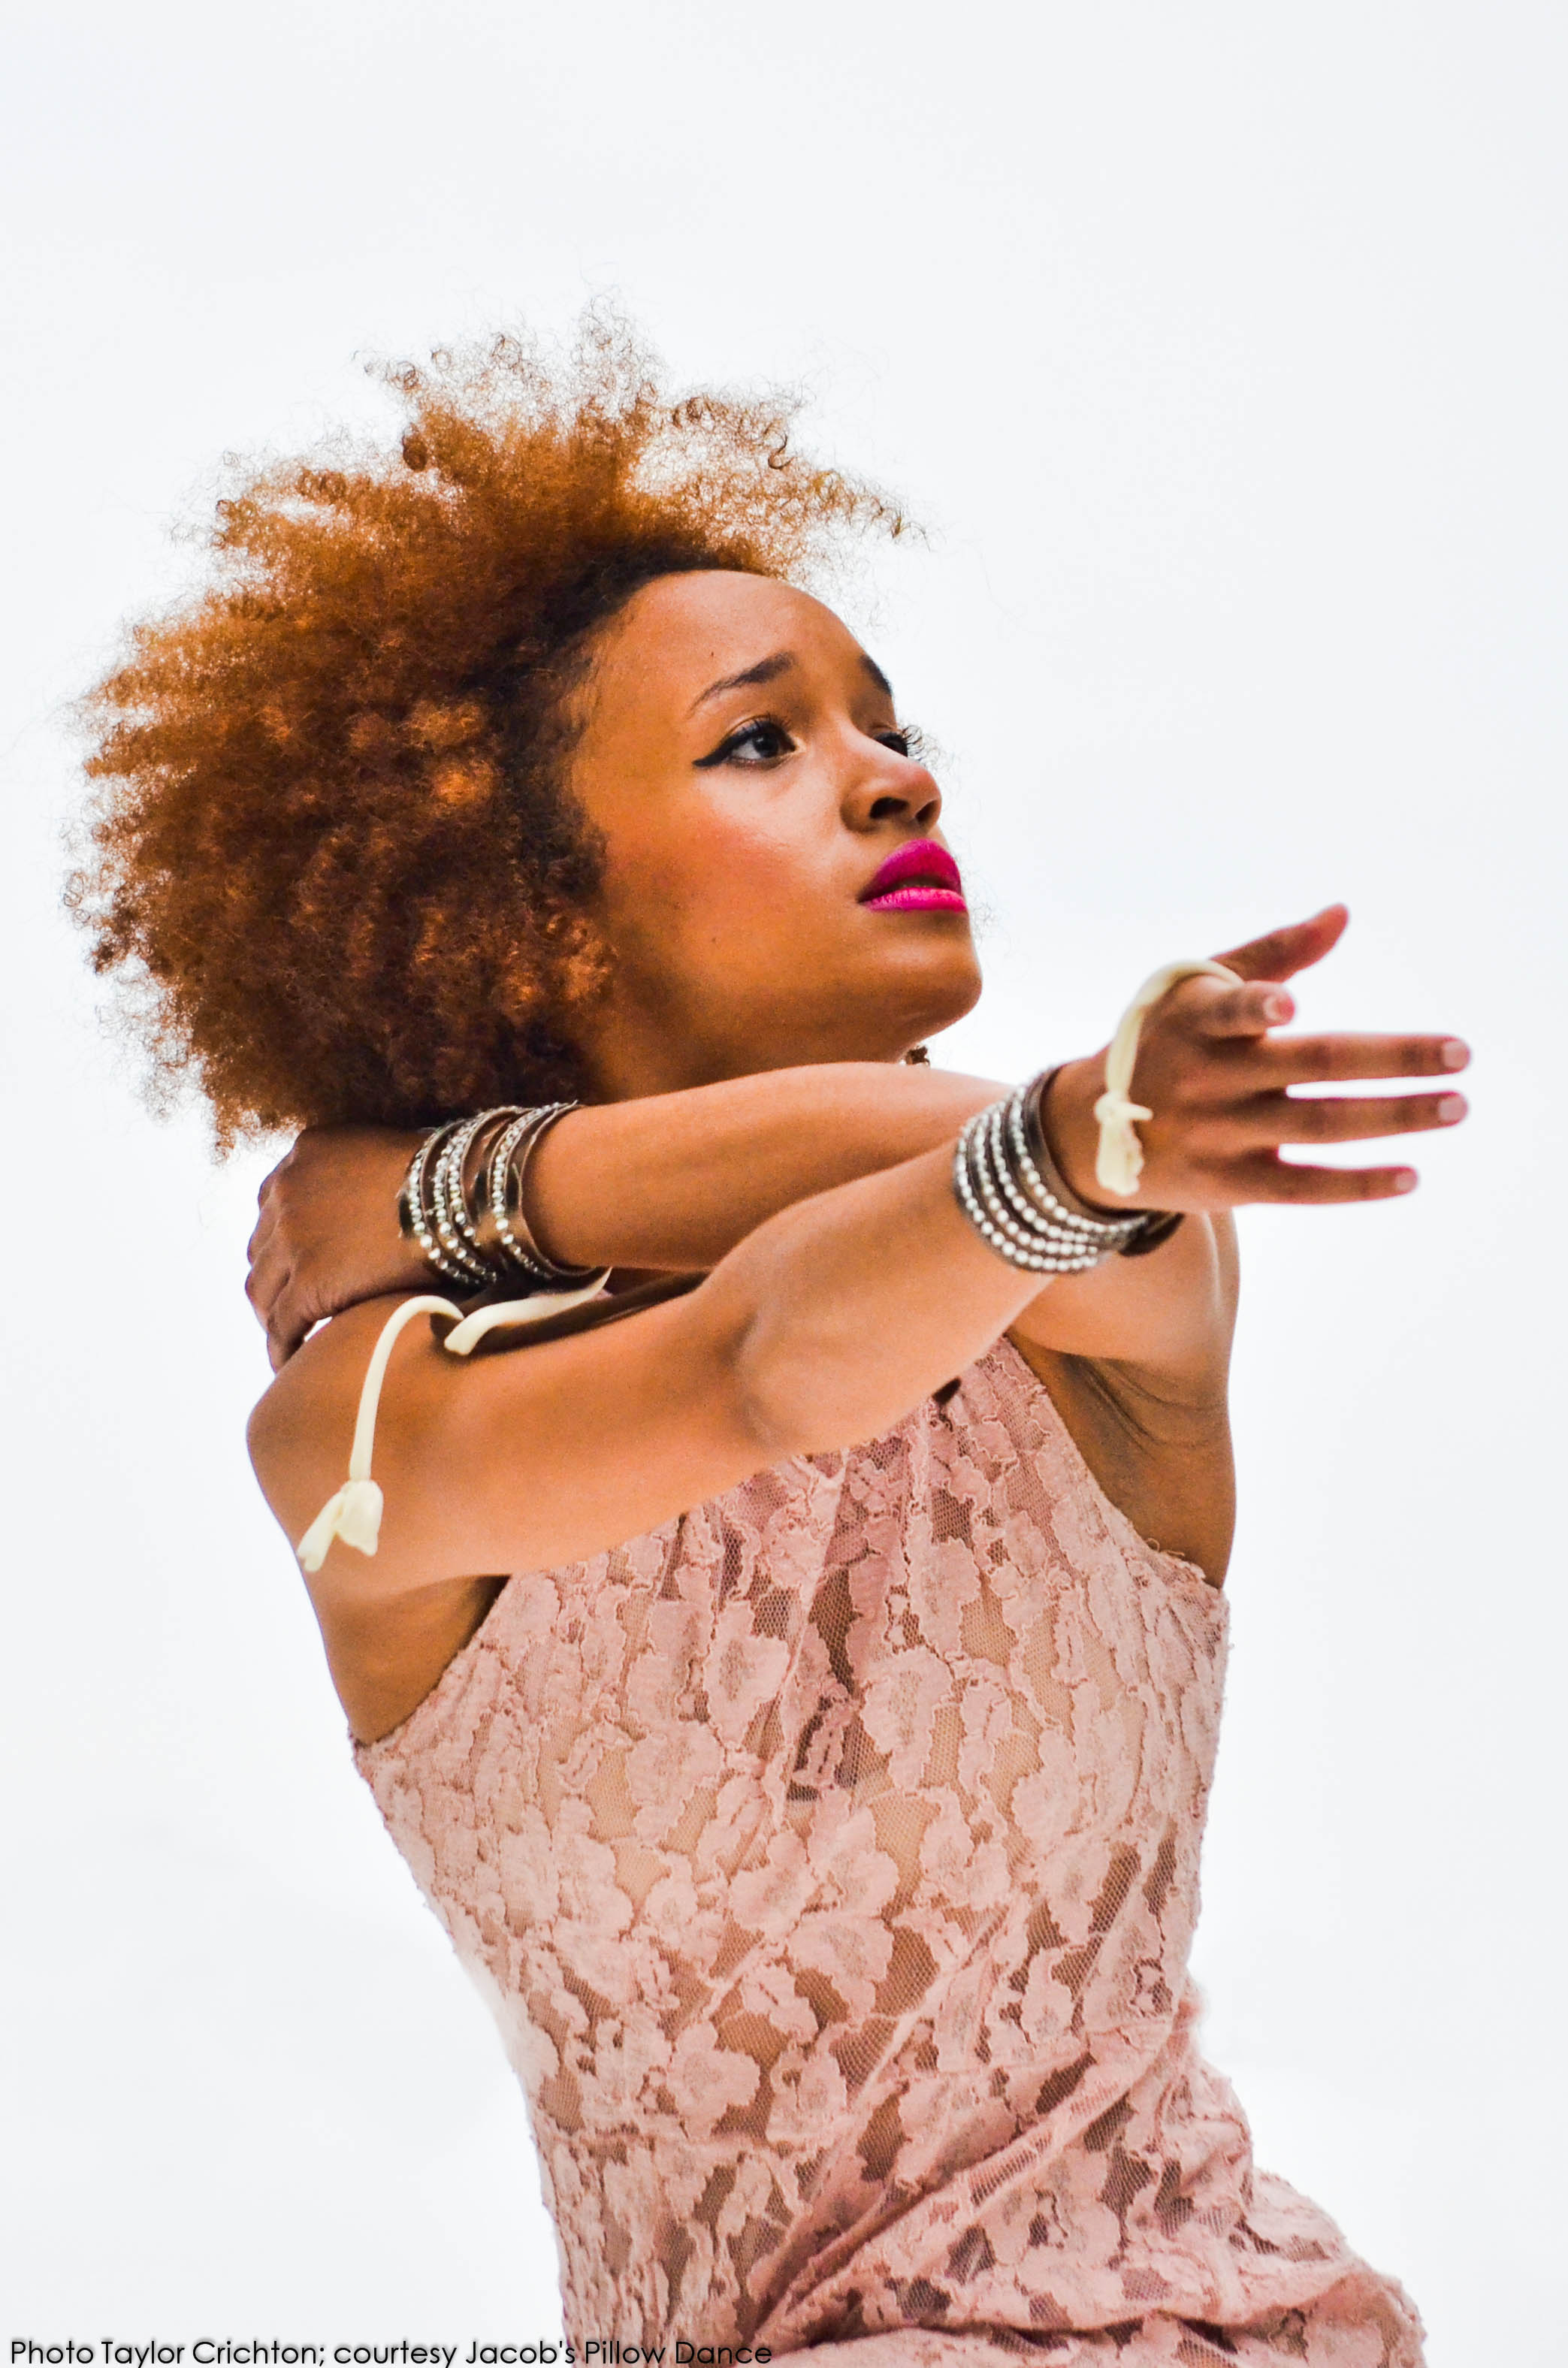 DanceSpora_InsideOut_2012TaylorCrichton_004.jpg